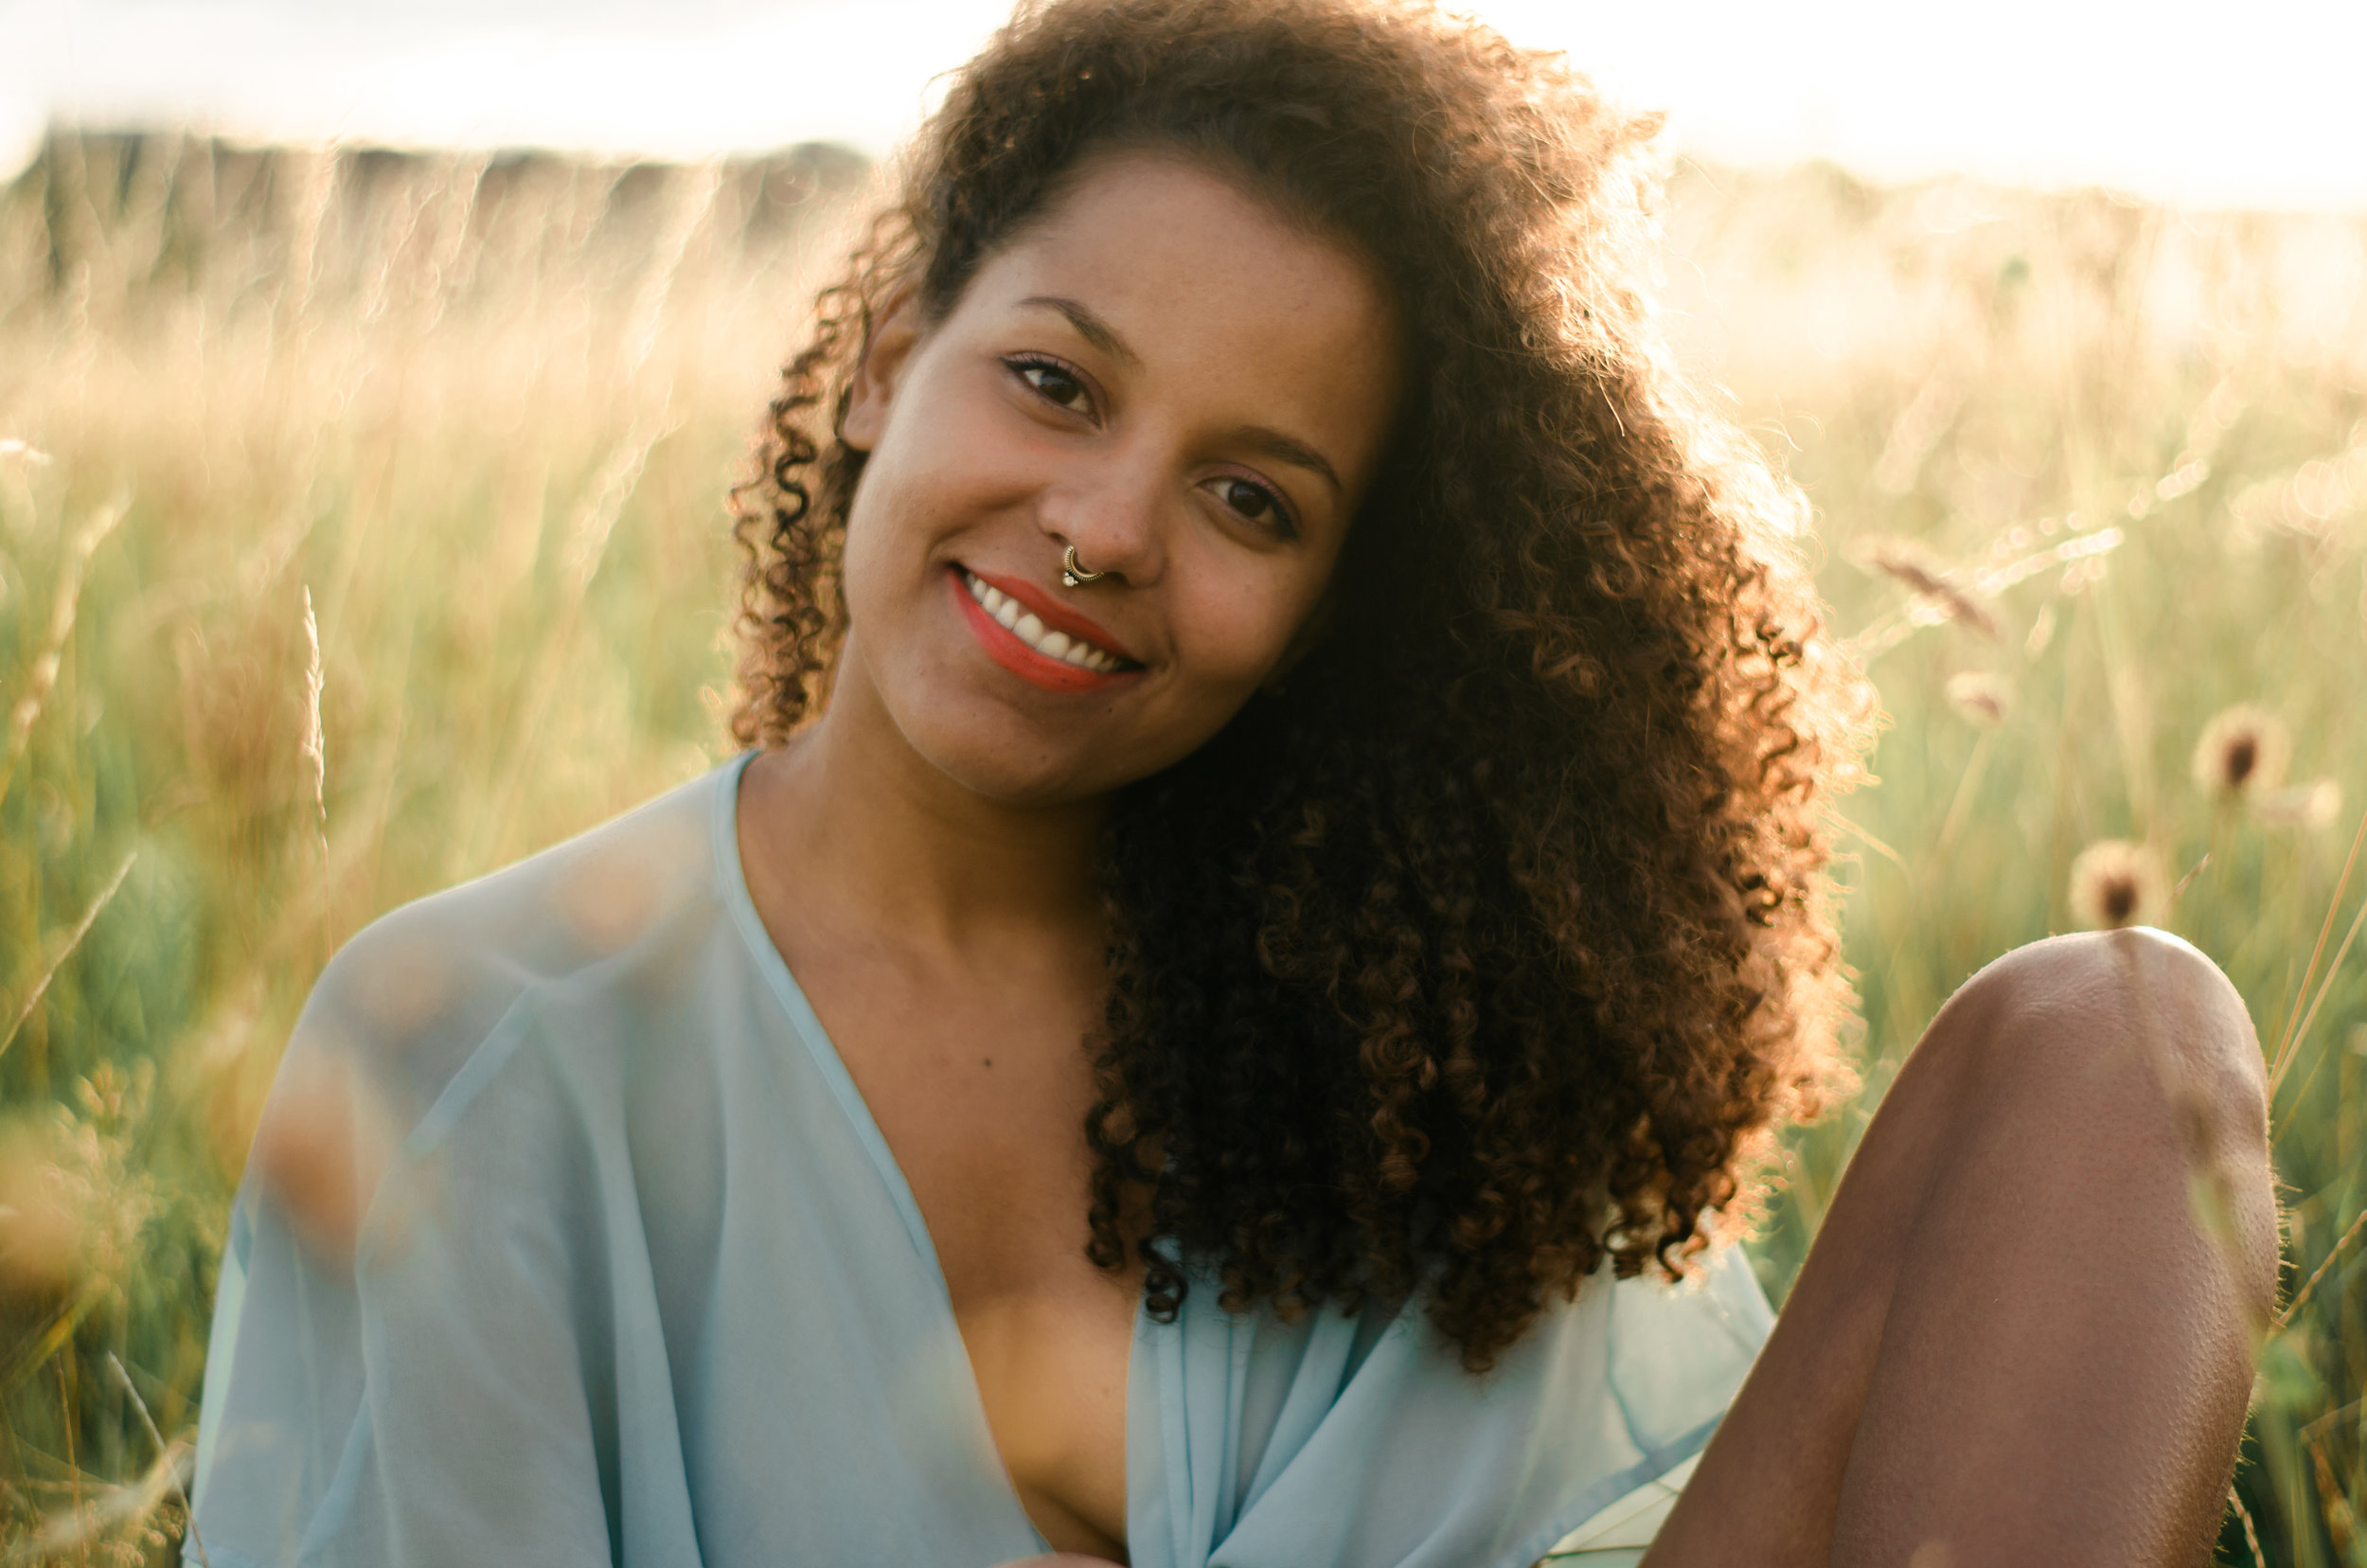 Inka-Portrait-Session-Aiste-Saulyte-Photography-17-07-30-359.jpg